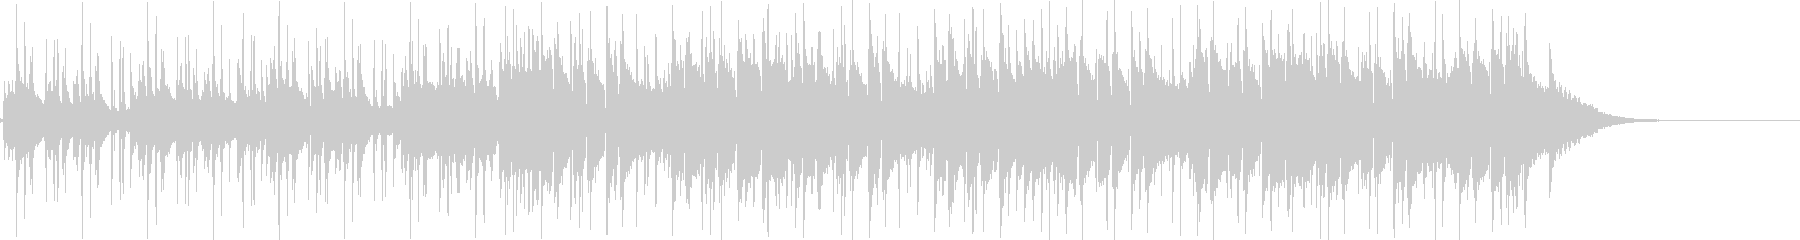 Pf「小田原」和風現代ジャズの未再生の波形